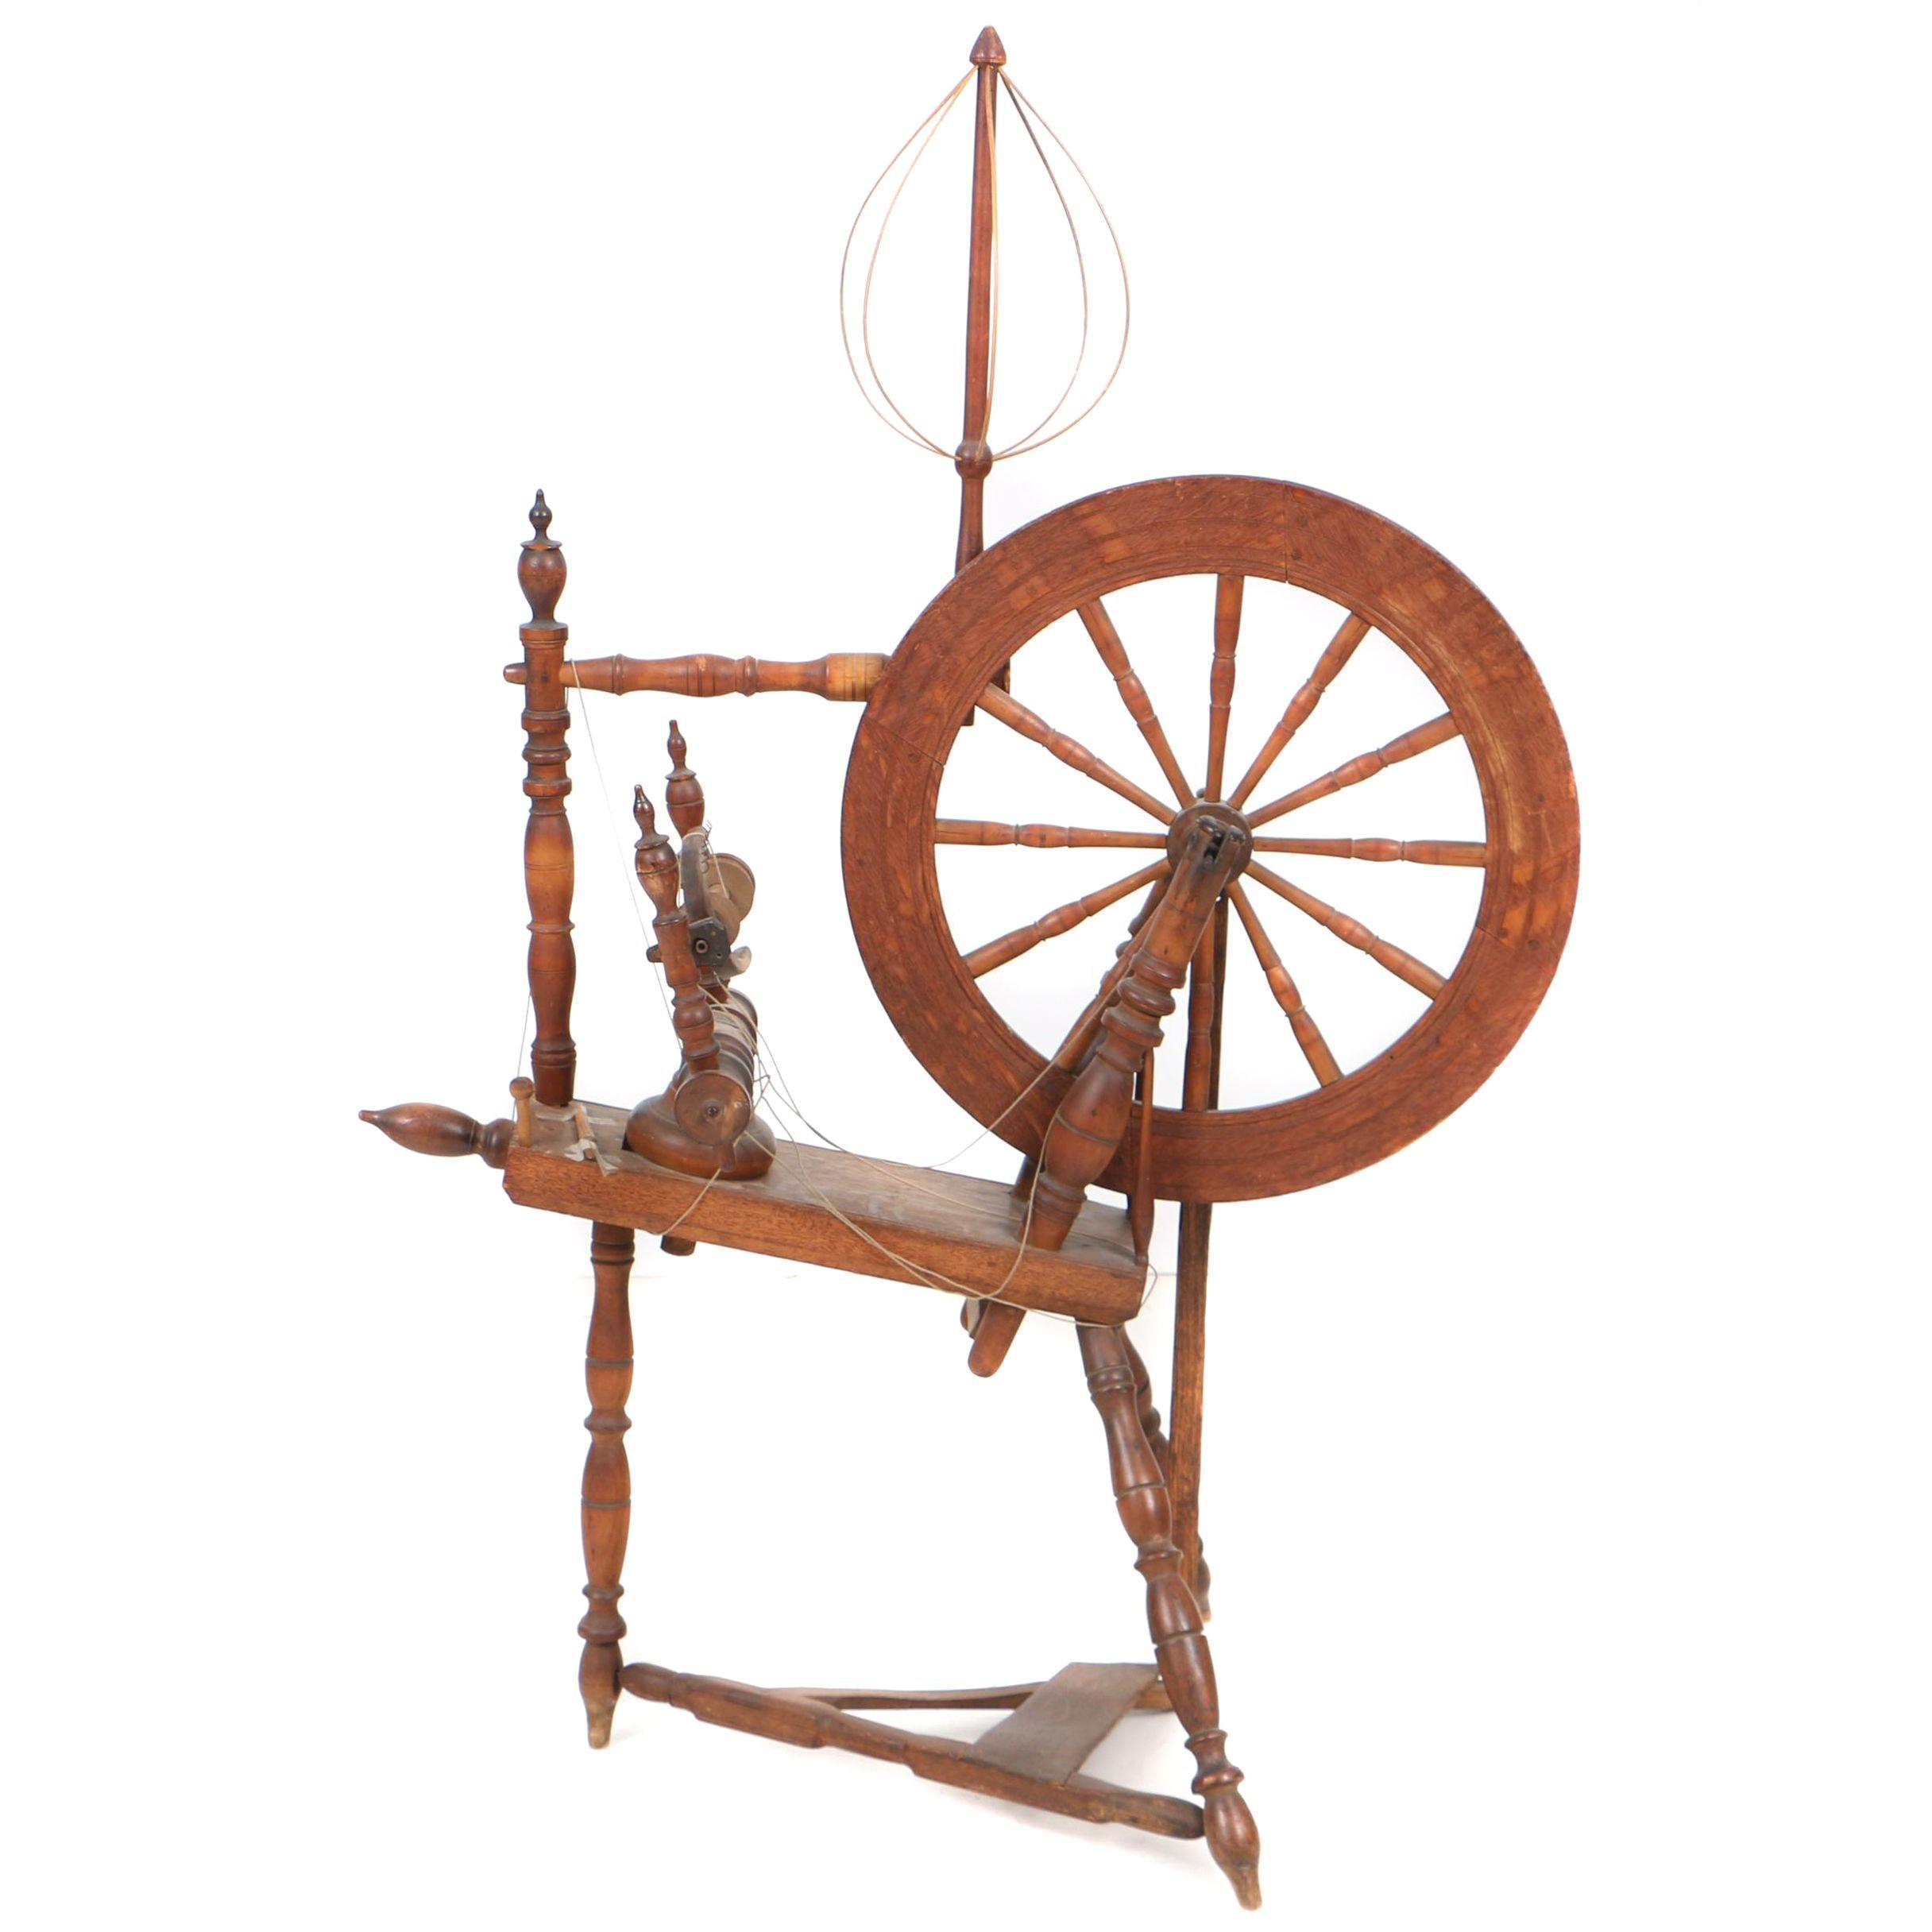 Antique Spinning Wheel Signed B. Klein, 19th Century